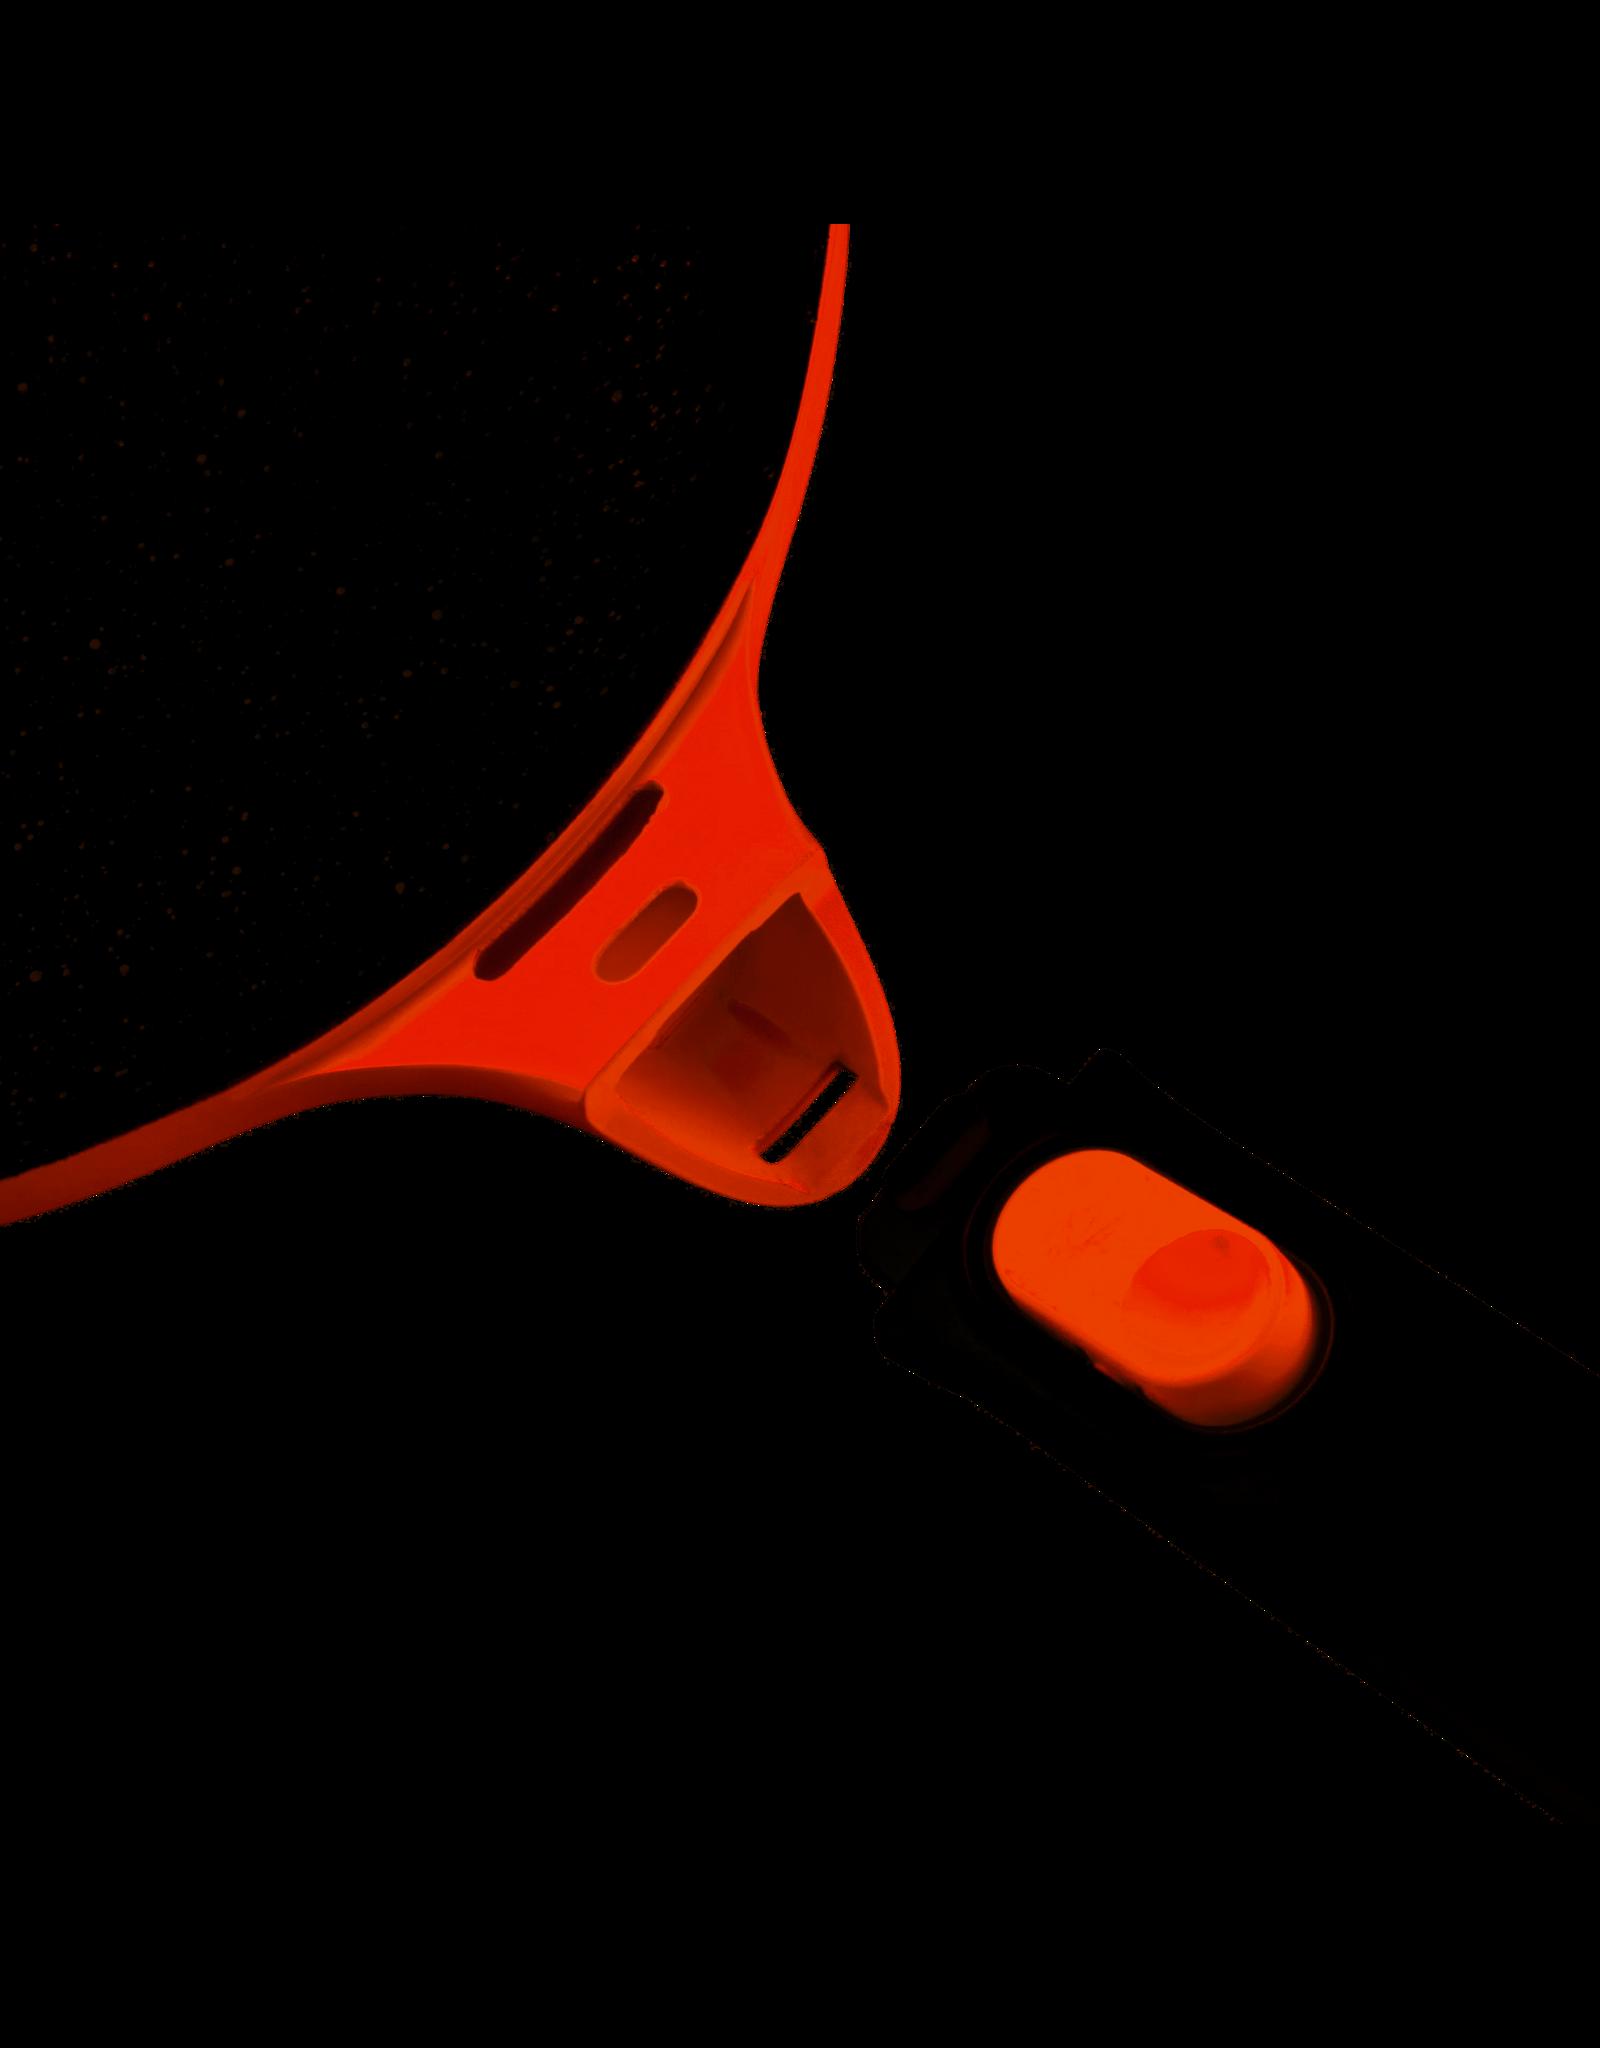 BERGHOFF Koekenpan 20 cm Aluminium, Oranje - BergHOFF |Gem